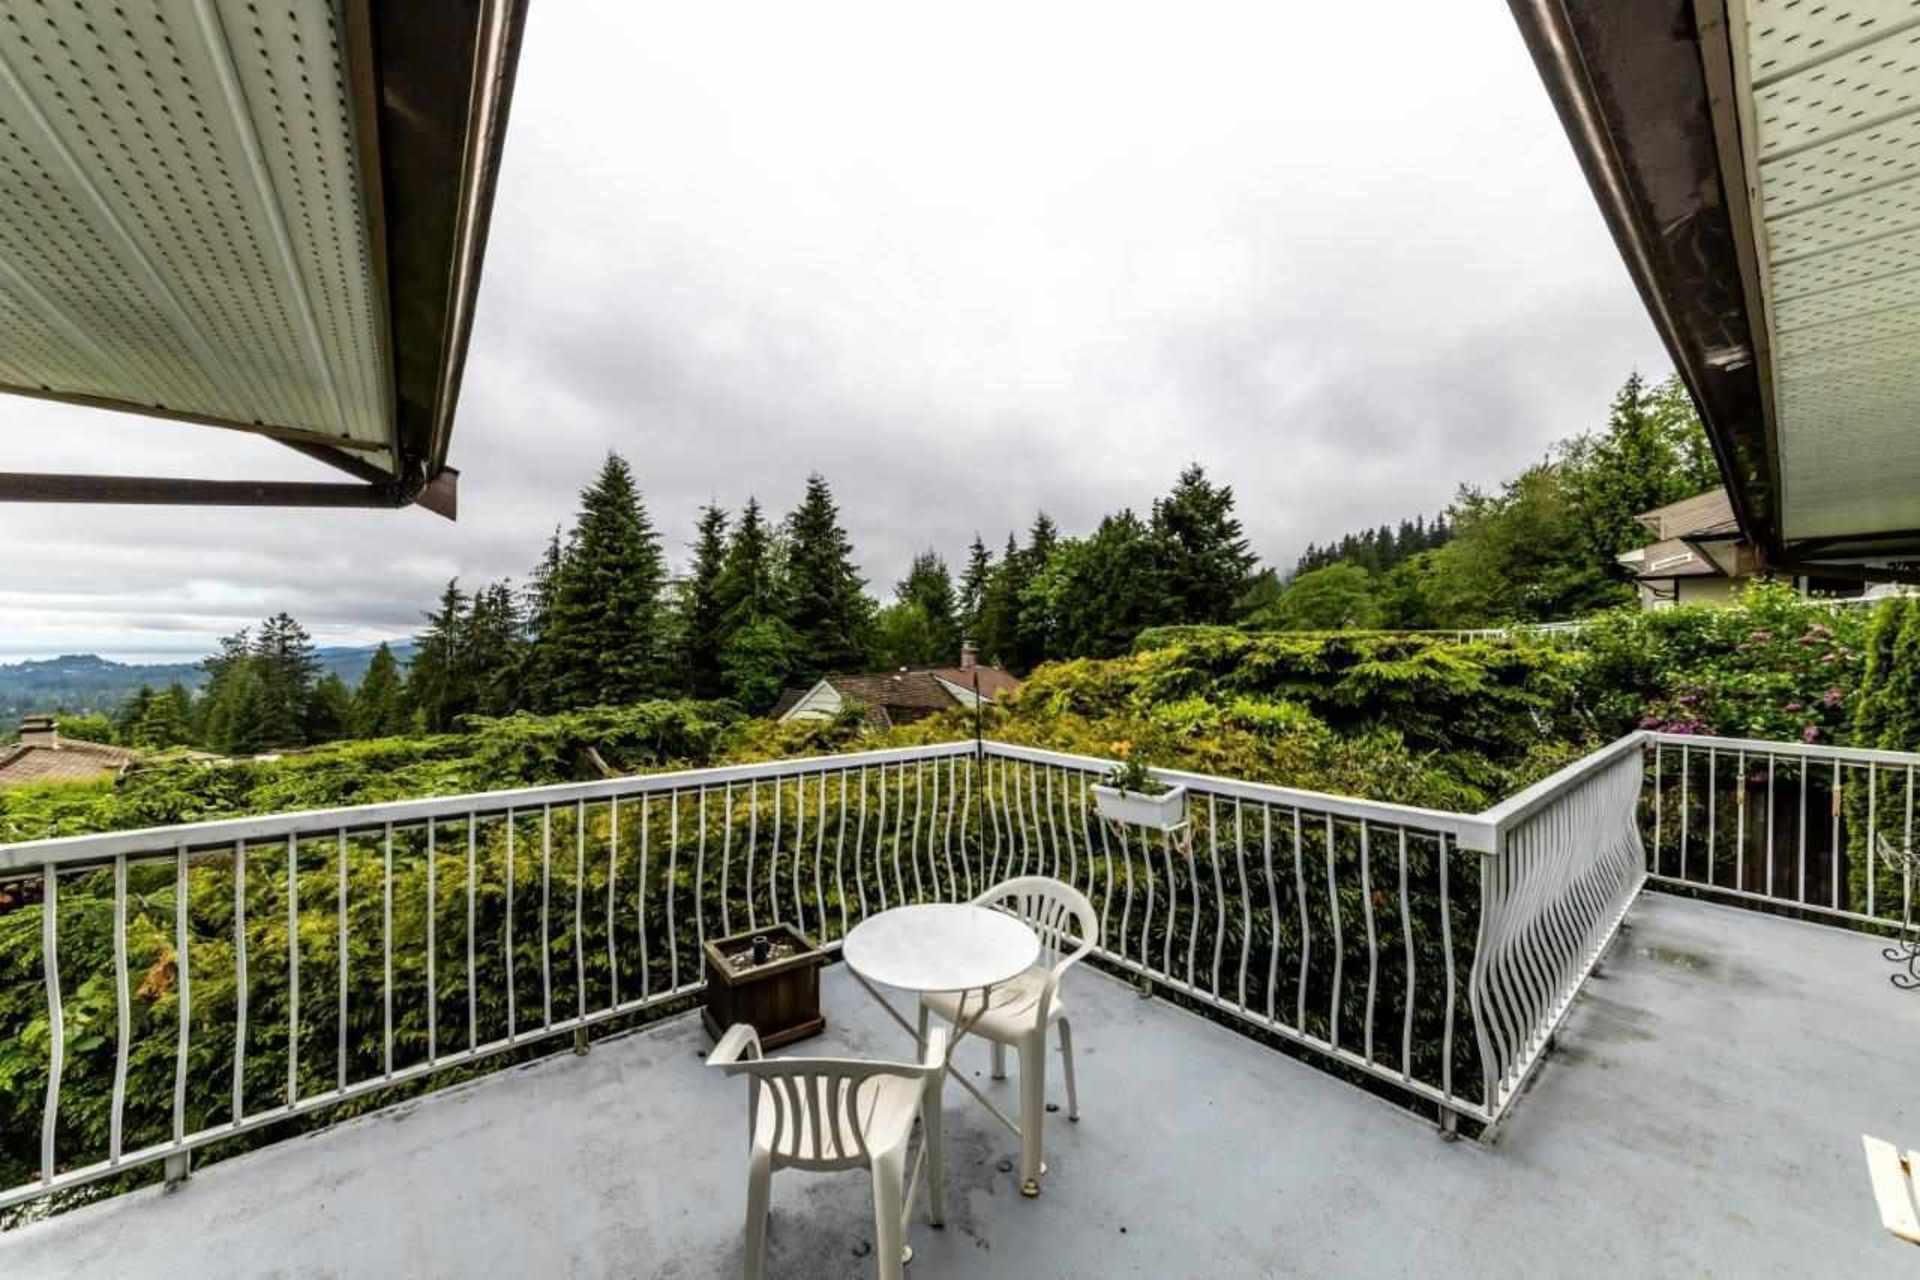 3863-st-pauls-avenue-upper-lonsdale-north-vancouver-18 at 3863 St. Pauls Avenue, Upper Lonsdale, North Vancouver